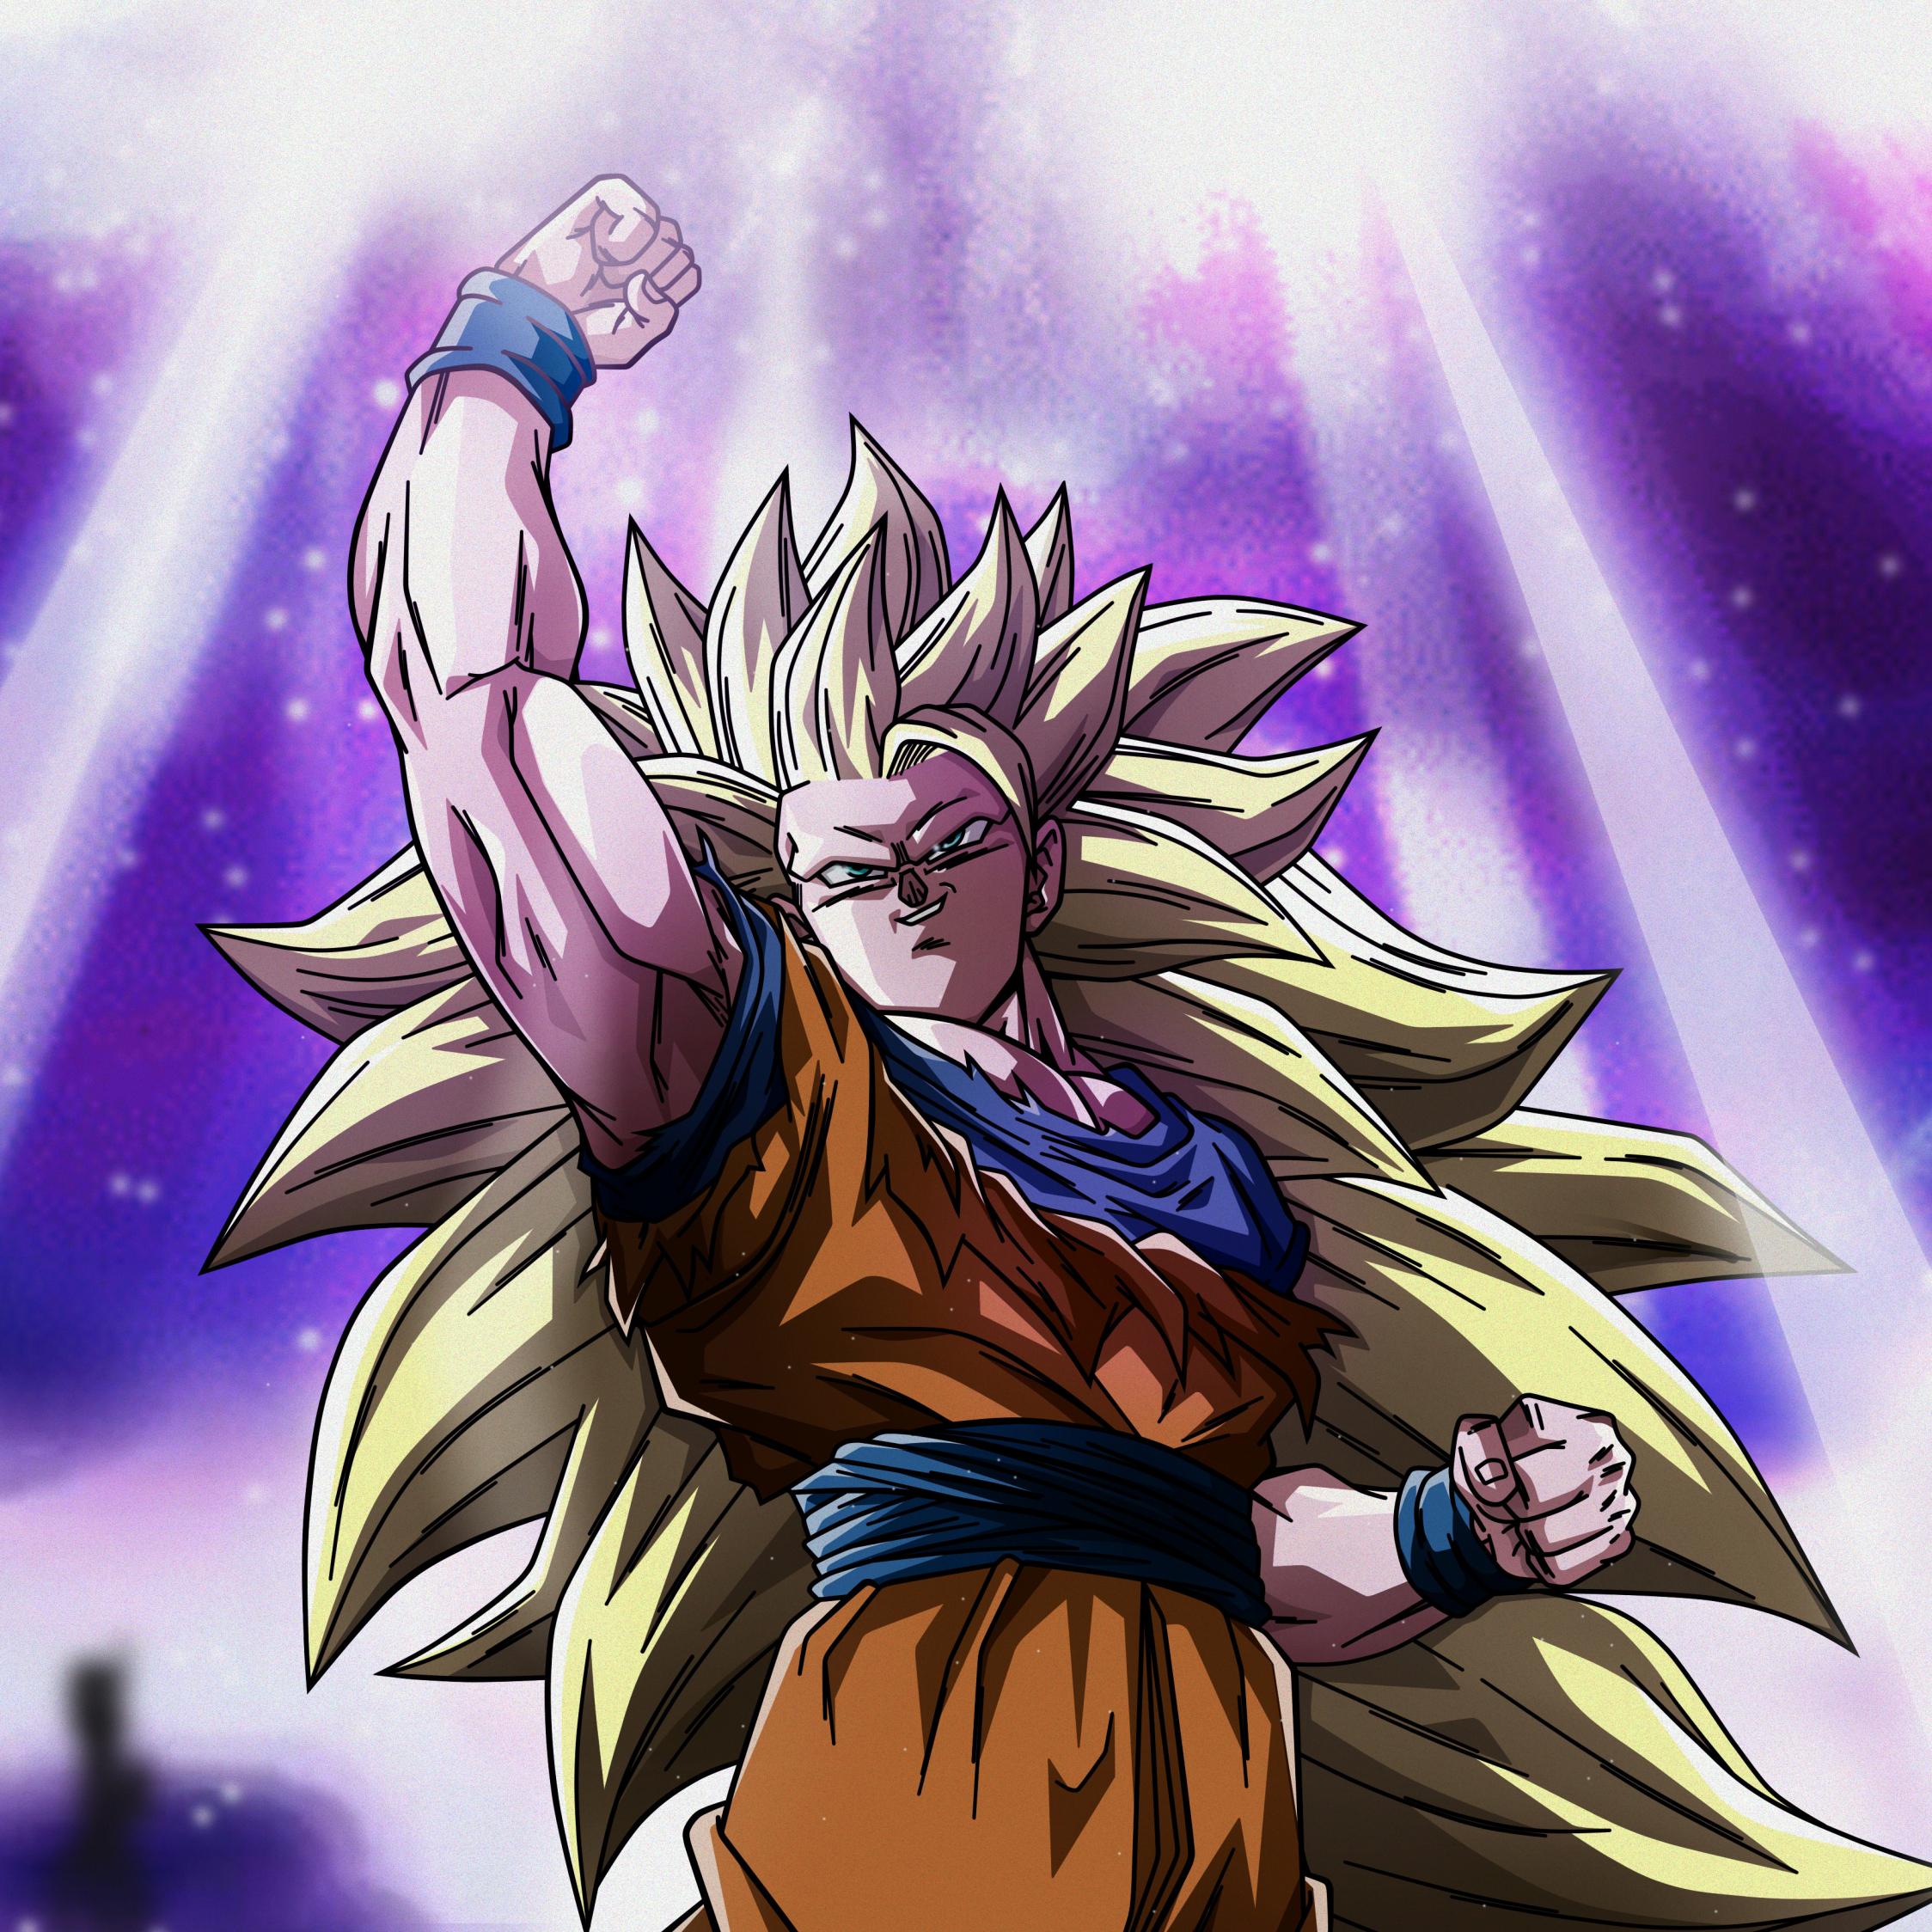 Download 2248x2248 Wallpaper Goku Super Saiyan Anime Dragon